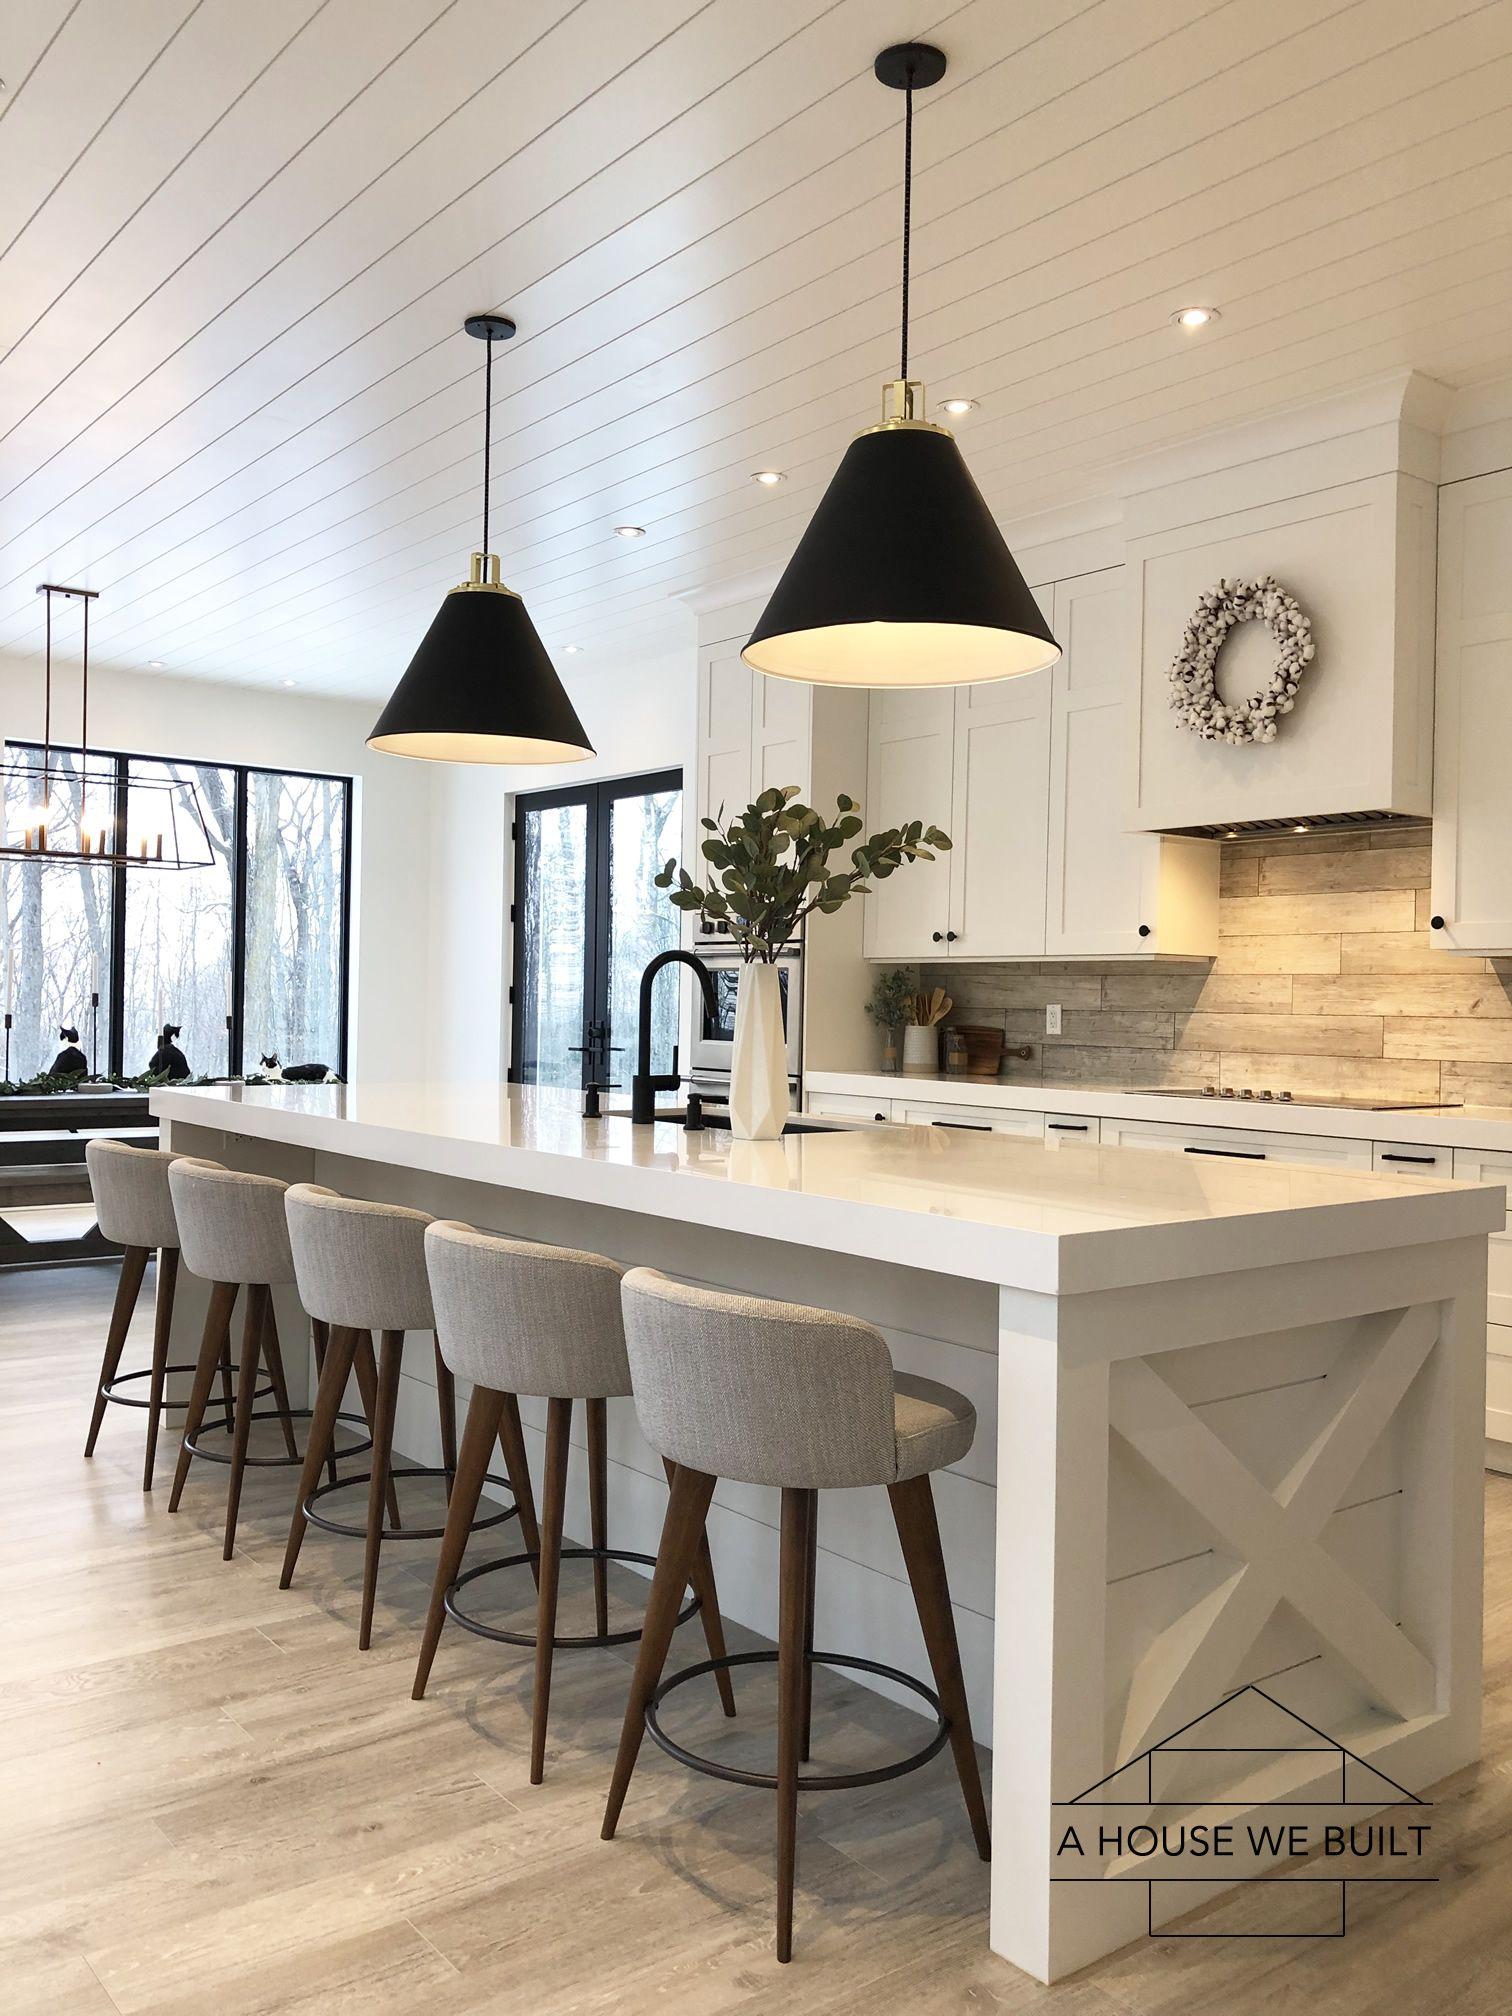 Custom House Designed by Husband & Wife Team   Modern Farmhouse Inspired